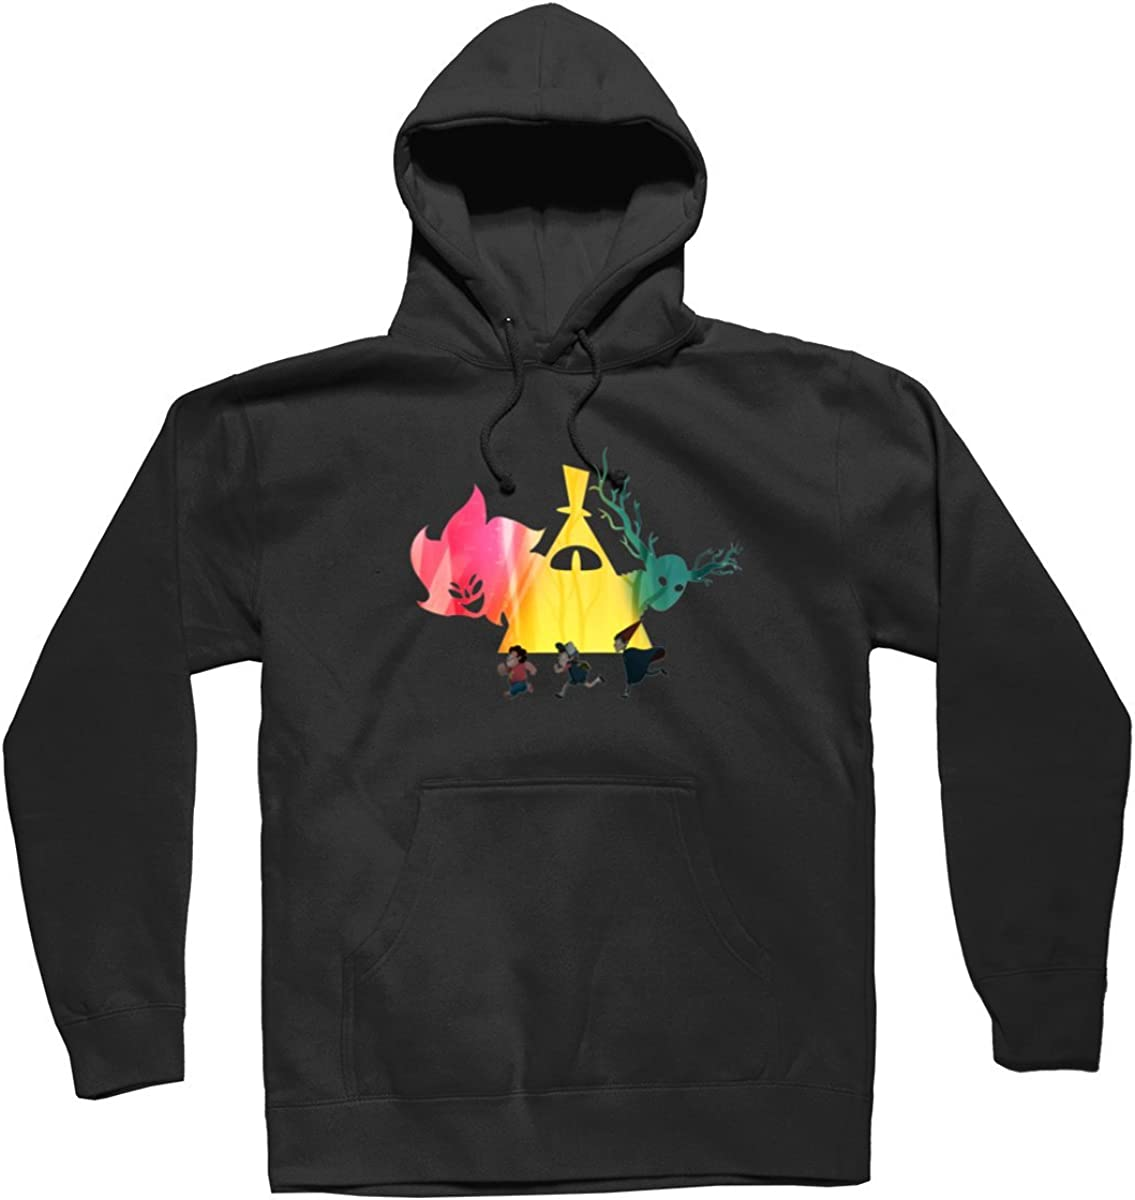 Steven Universe Gravity Falls Over The Garden Wall Unisex Hoodies Sweater